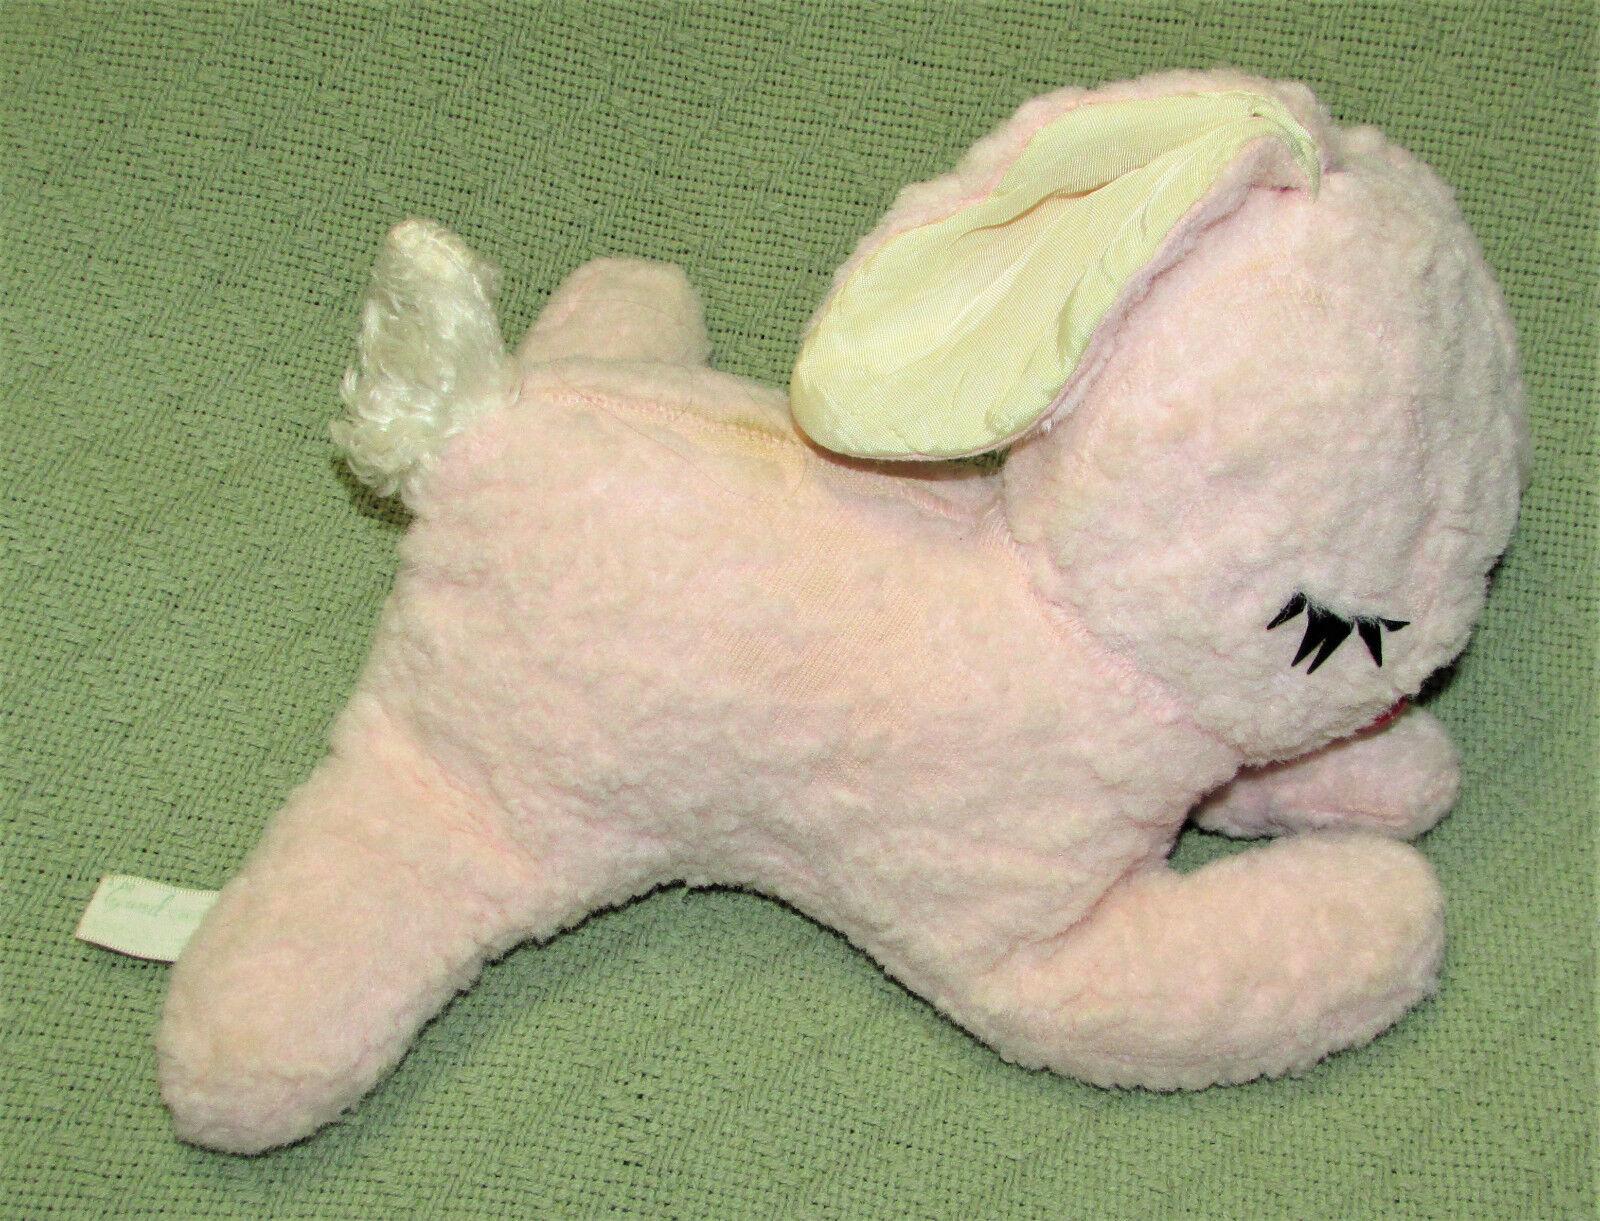 11  Vintage GUND CREATIONS Pink Bunny J SWEDLIN Rabbit Plush Stuffed Sleeping